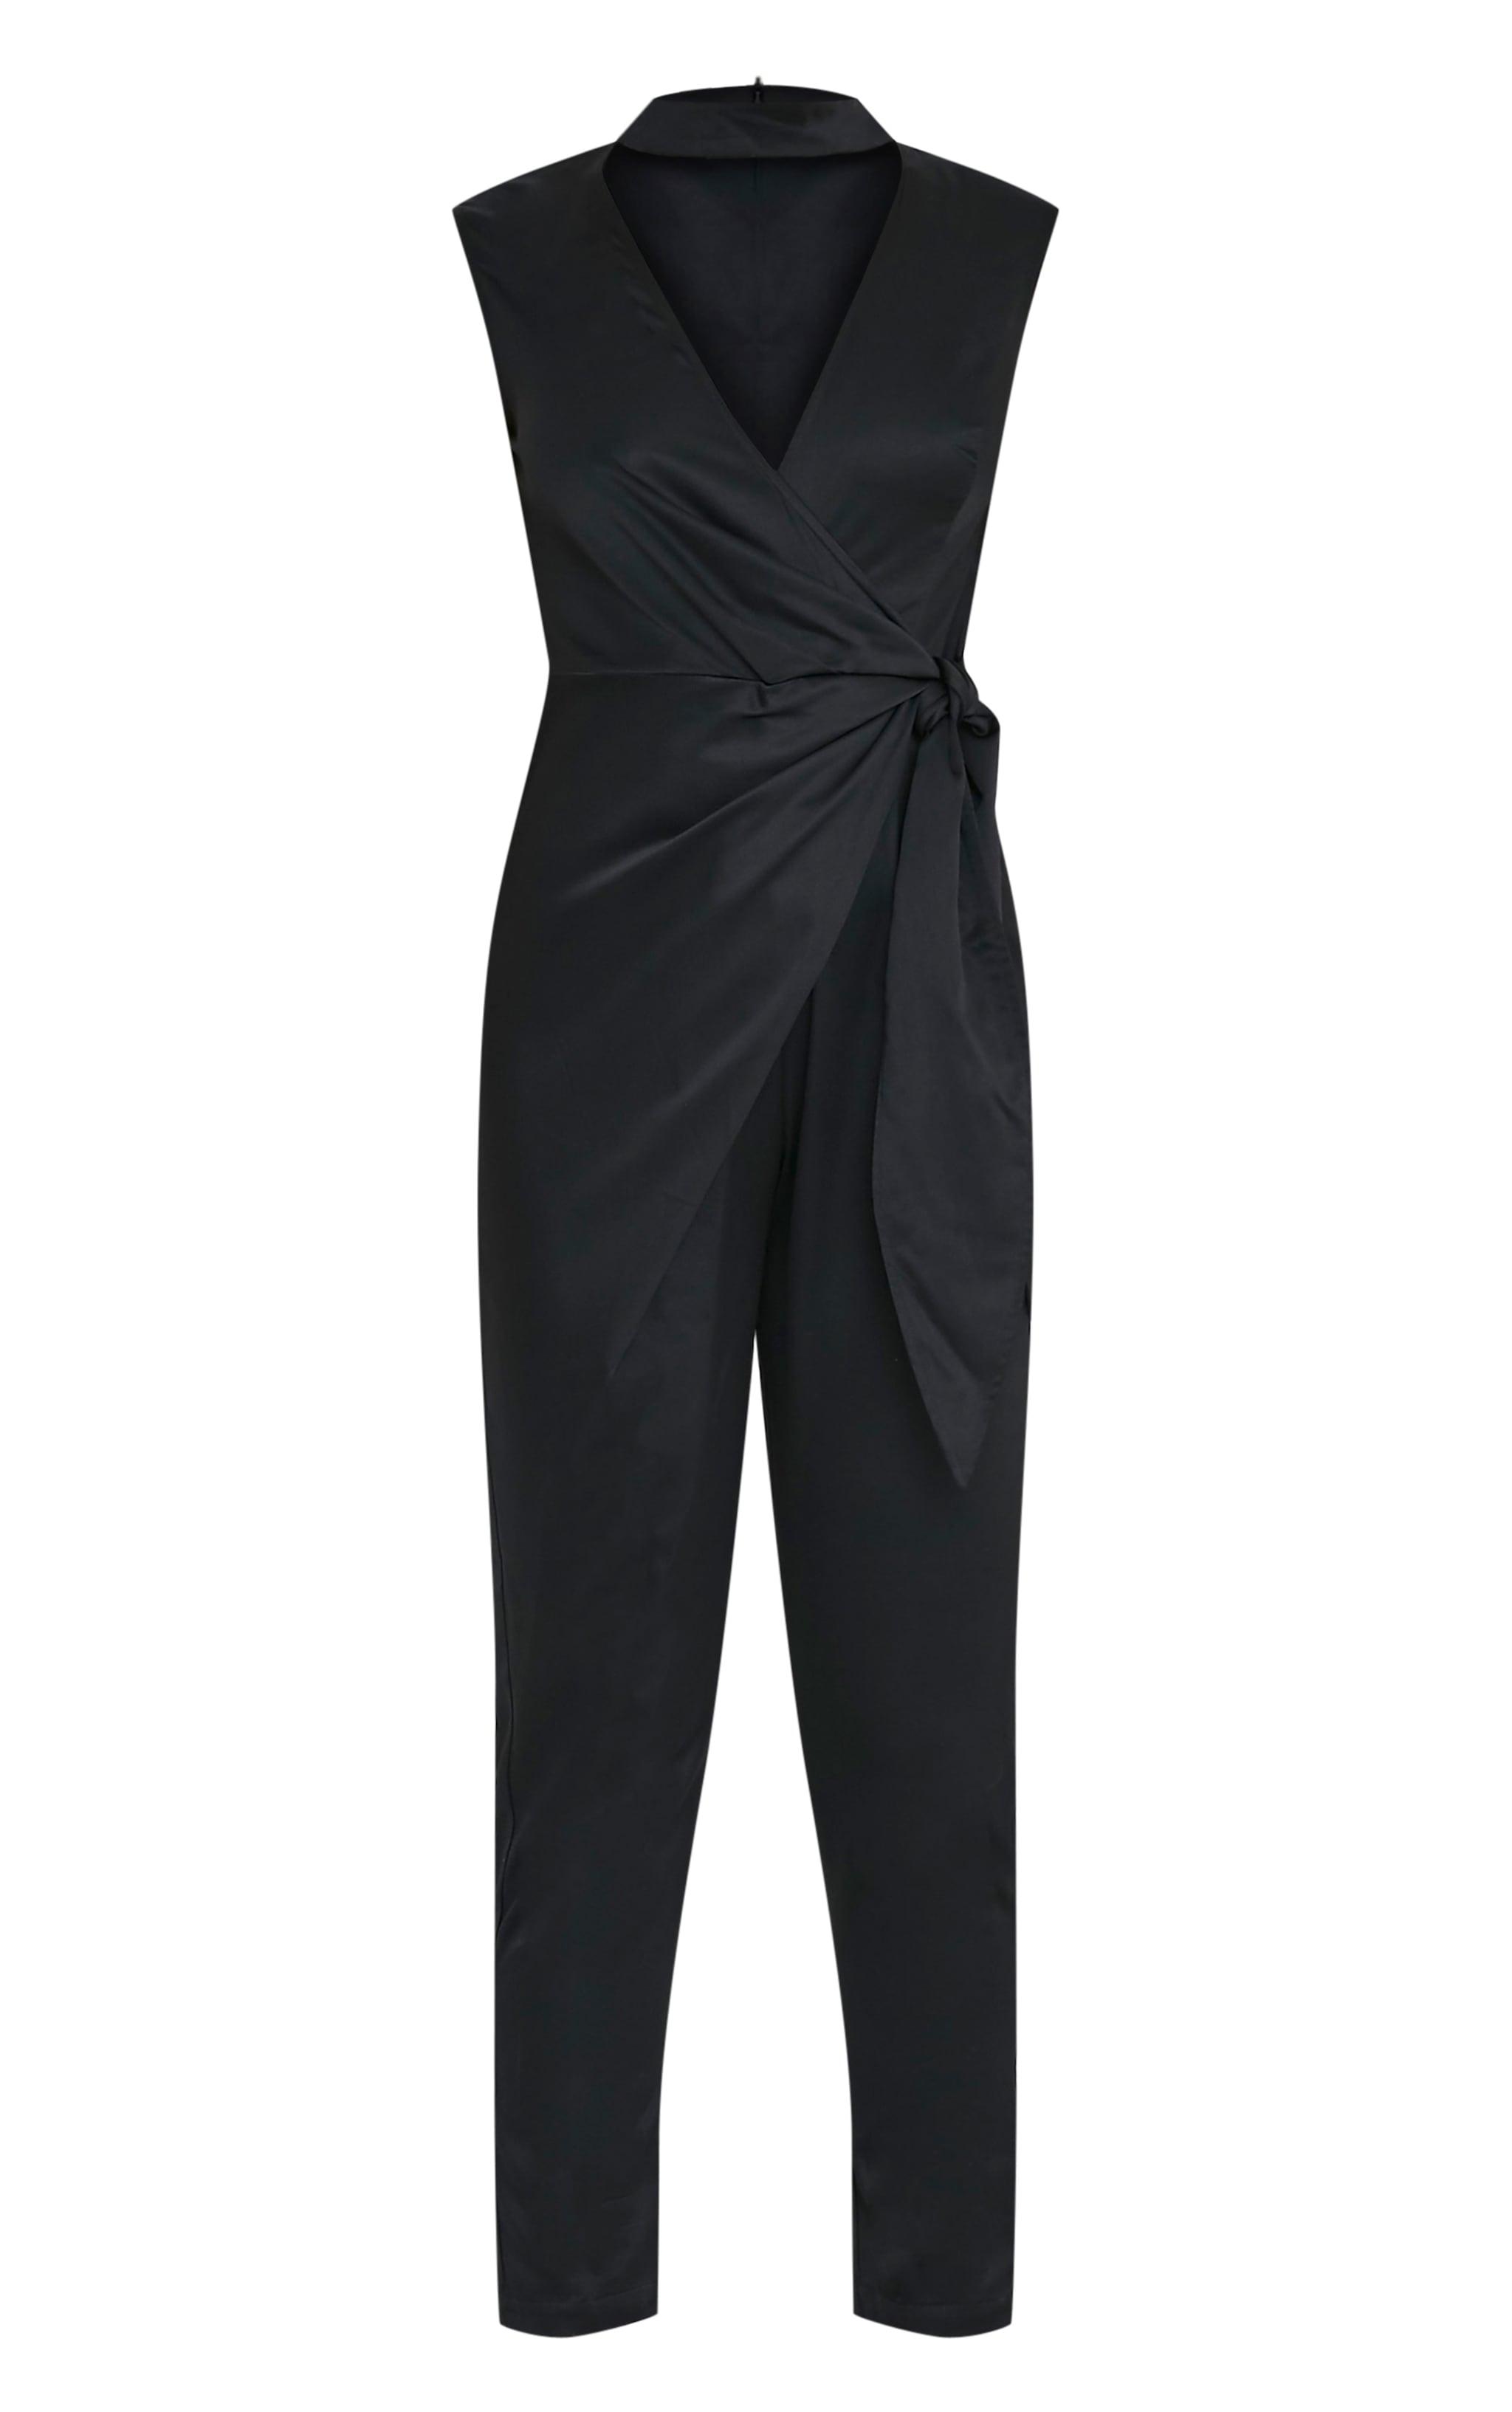 Carla Black Tie Side Choker Detail Satin Jumpsuit 3